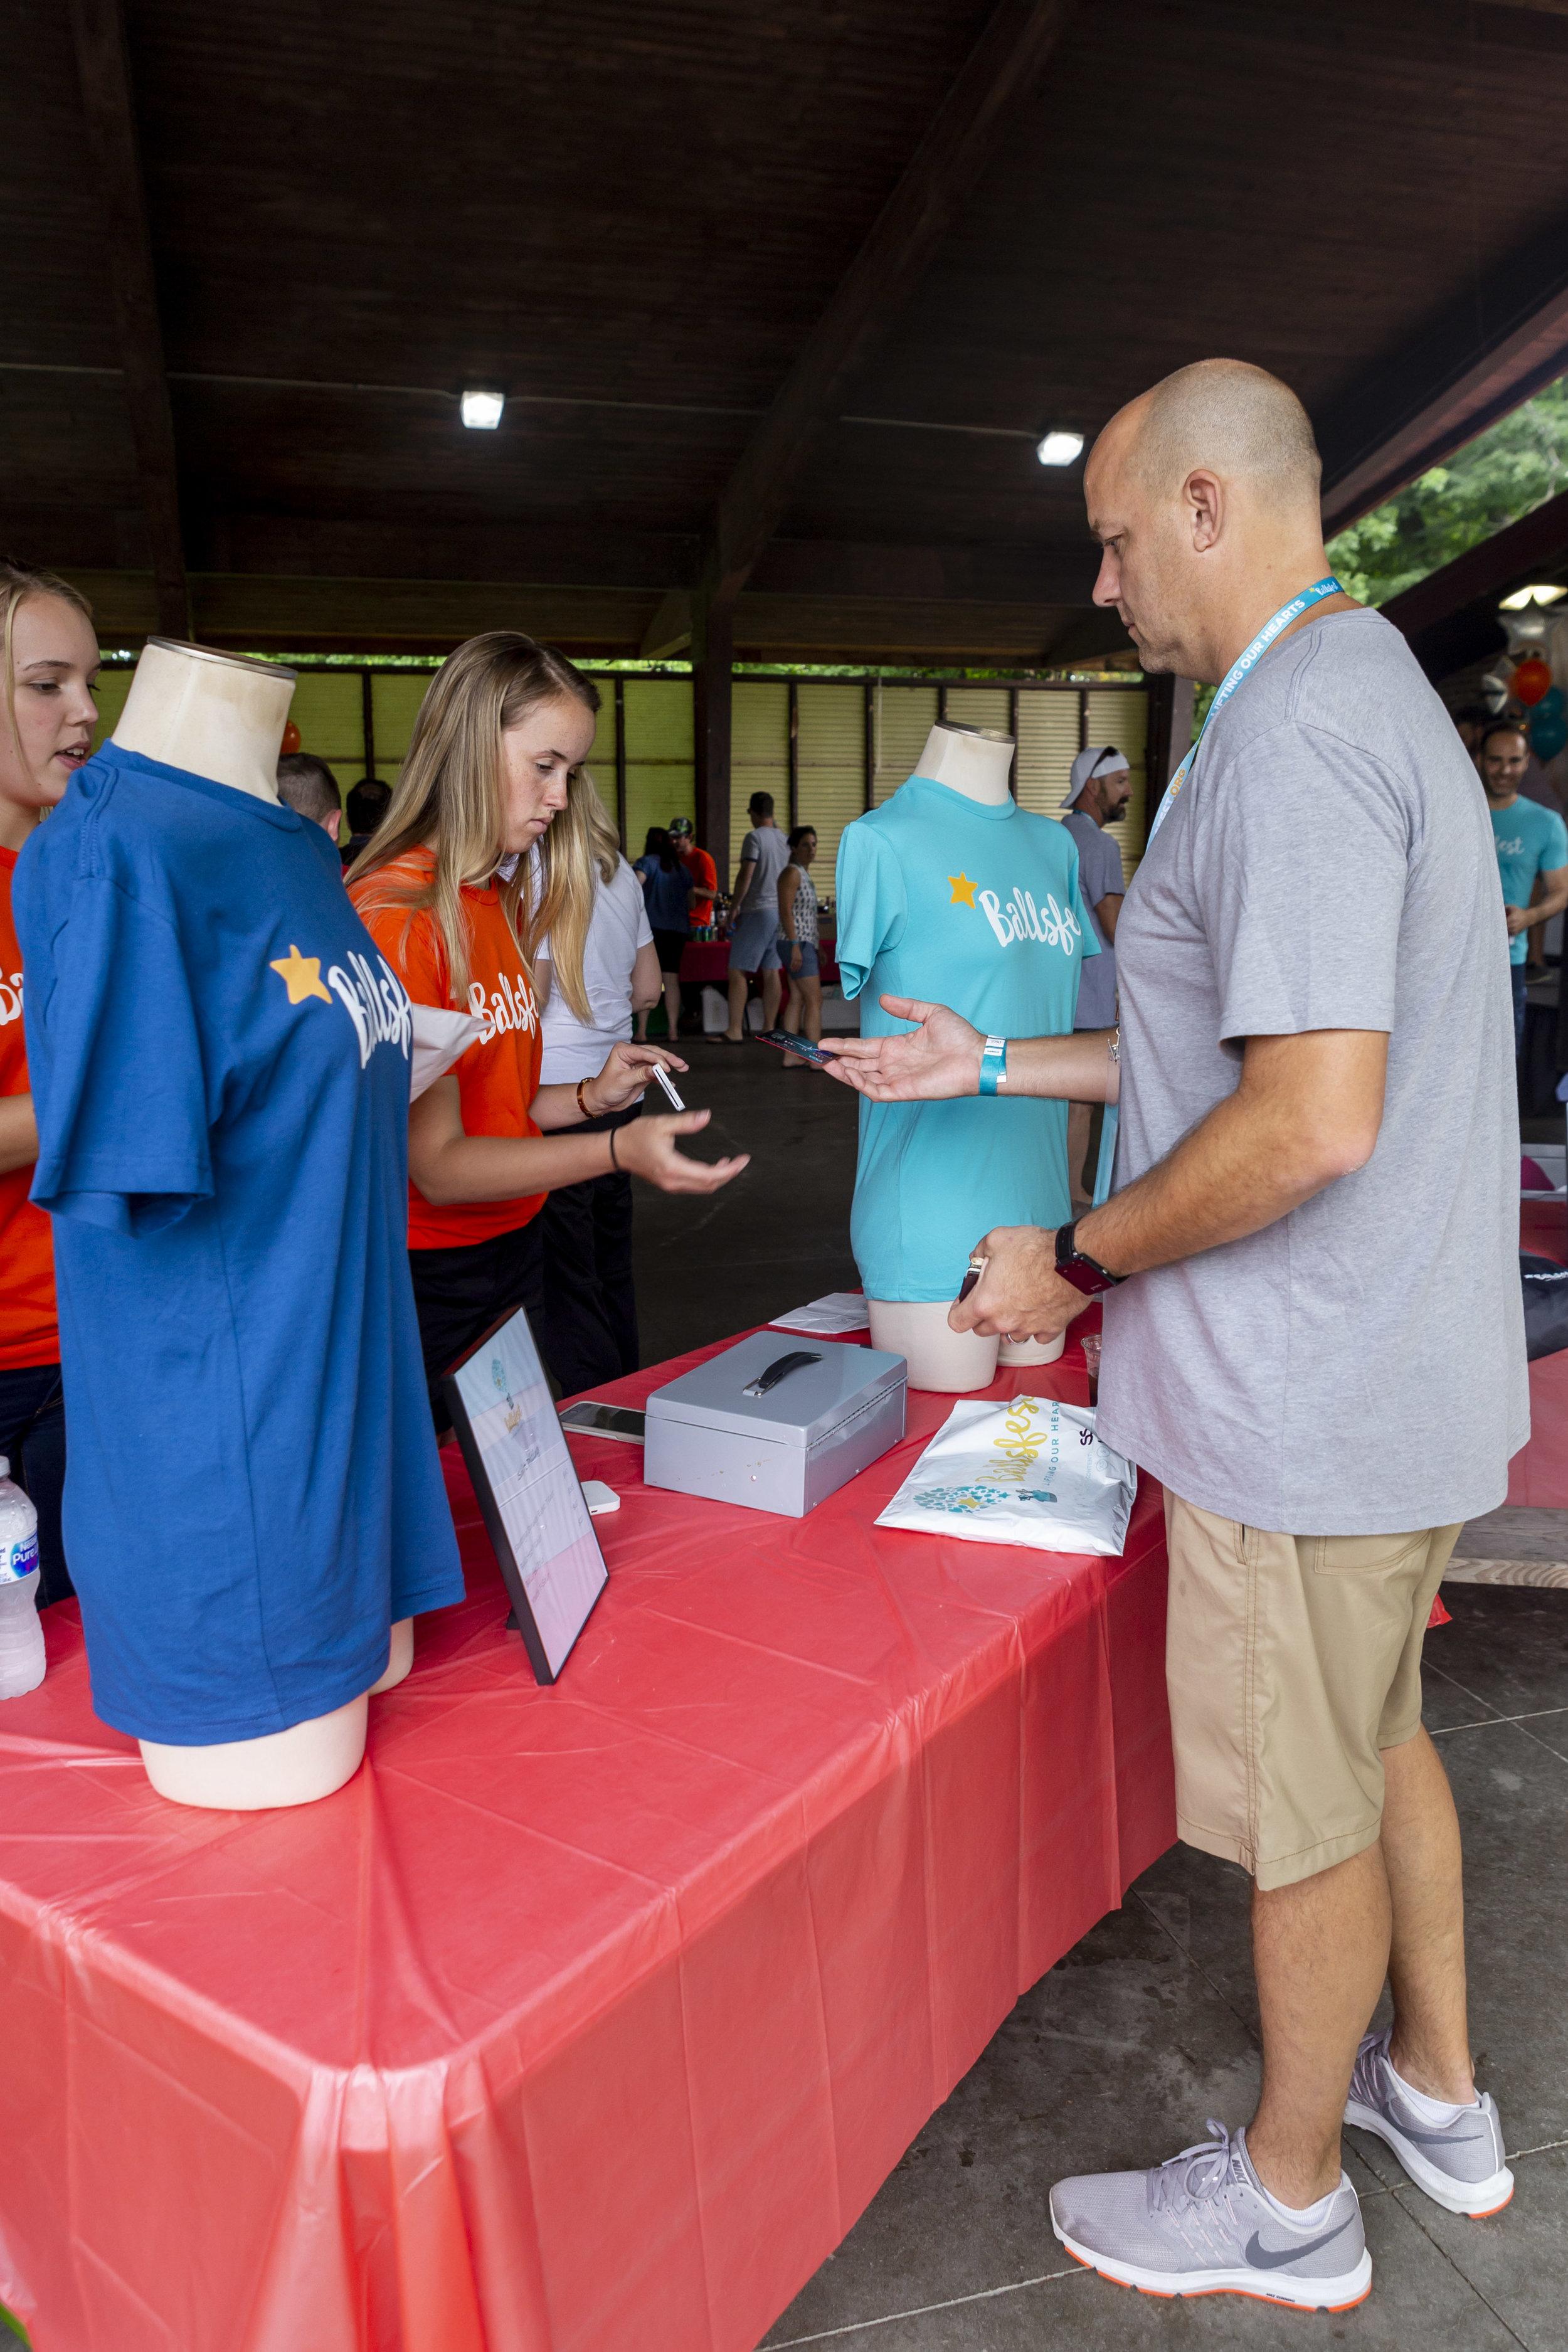 (2018.07.14) Ballsfest Saratoga Spa State Park-3520.jpg